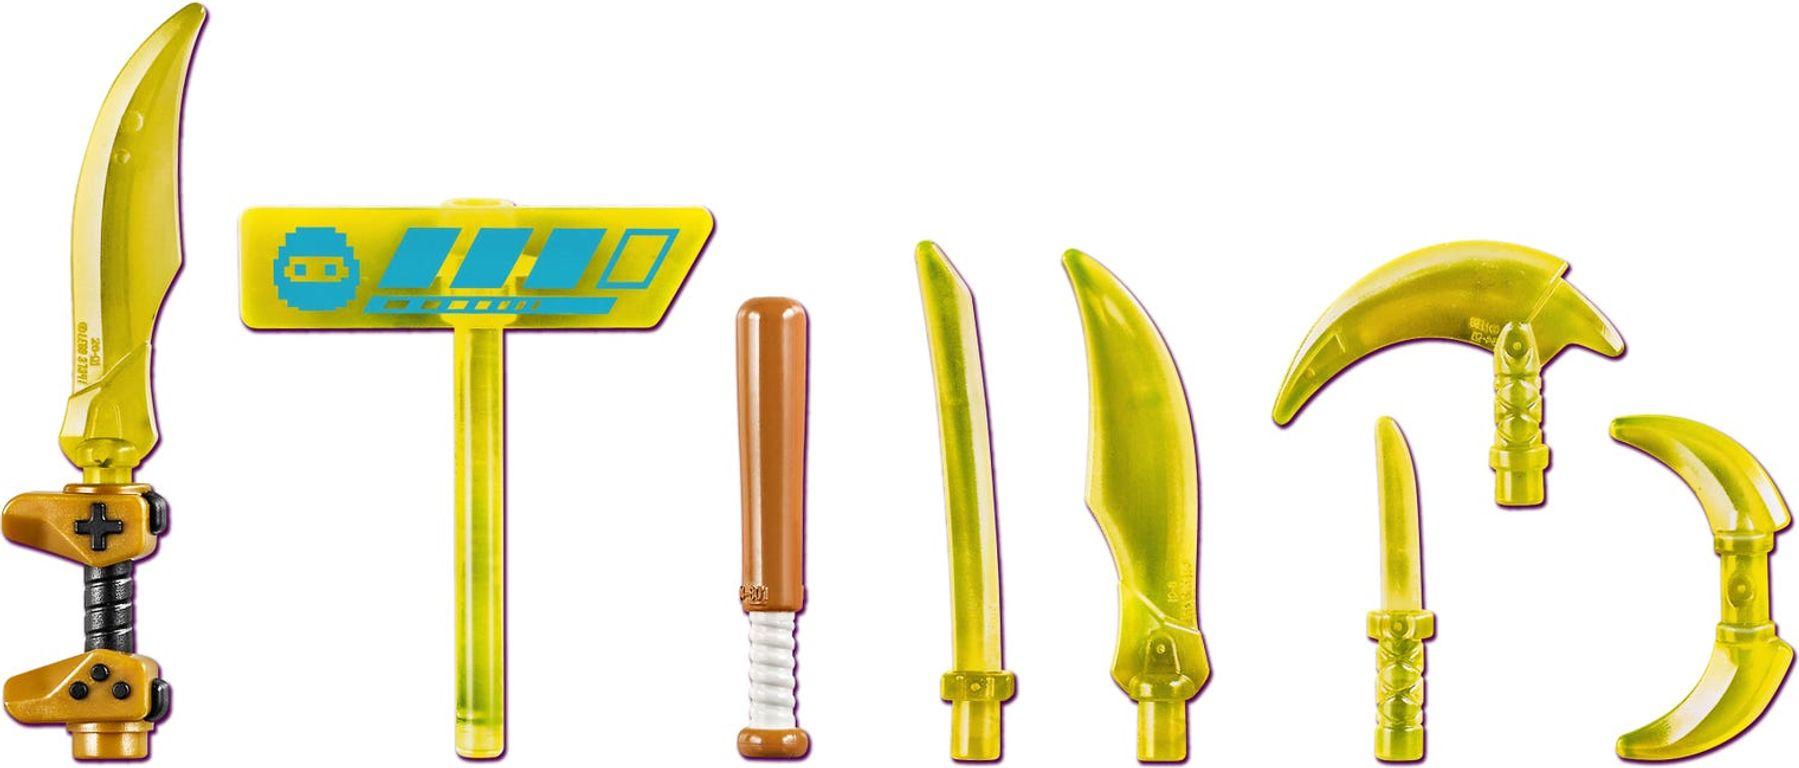 LEGO® Ninjago Lloyd Avatar - Arcade Pod weapons